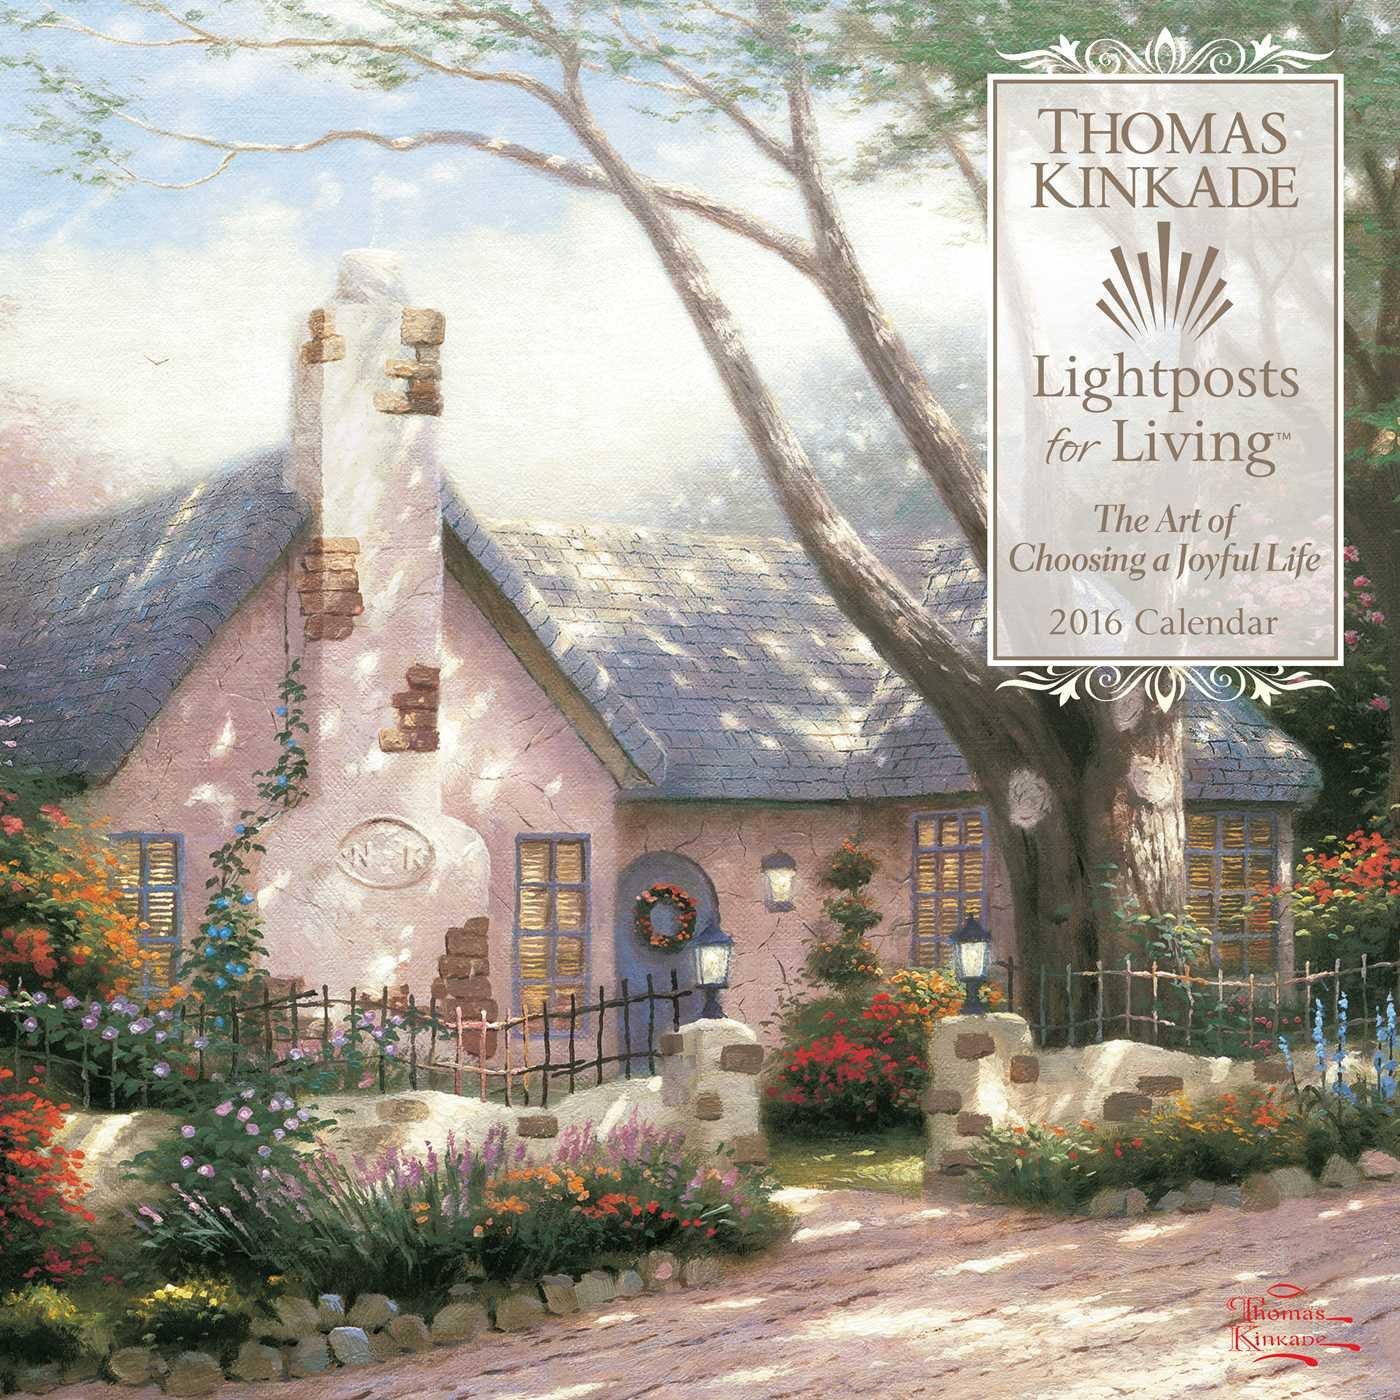 thomas kinkade lightposts for living 2015 wall calendar